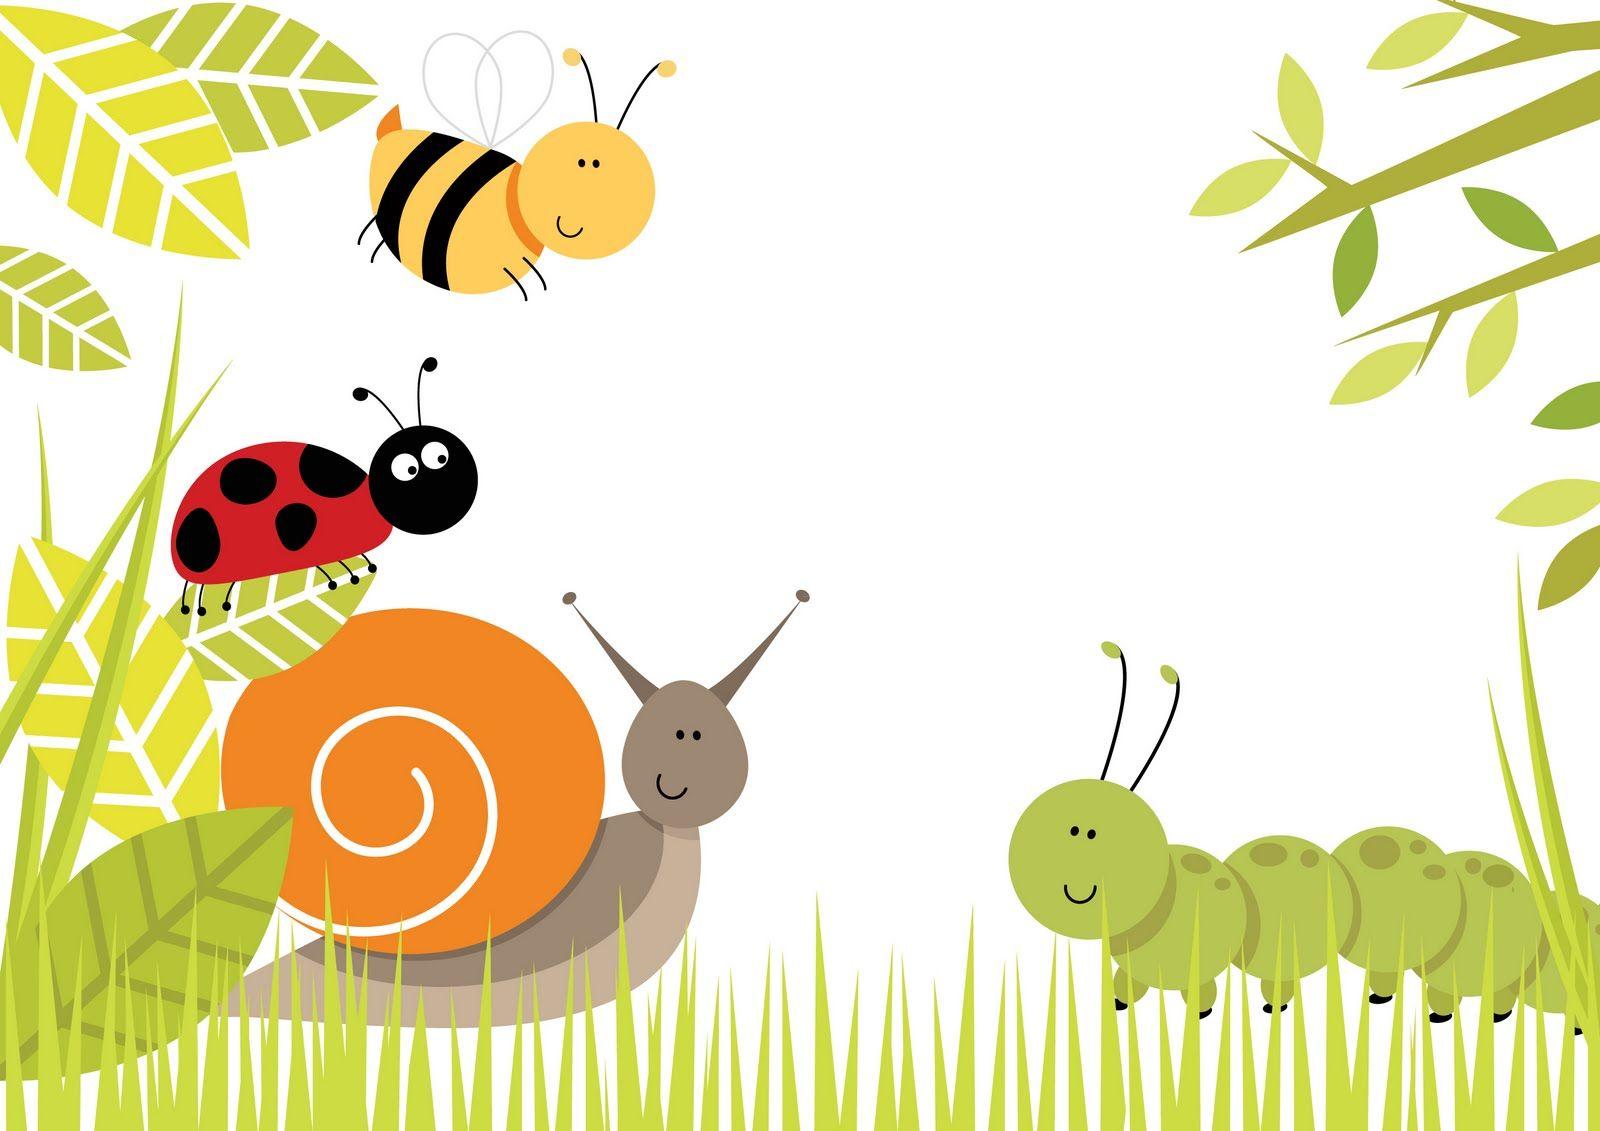 Cute Bug 27 Wallpaper Background Hd | Painted Pots | Pinterest ...